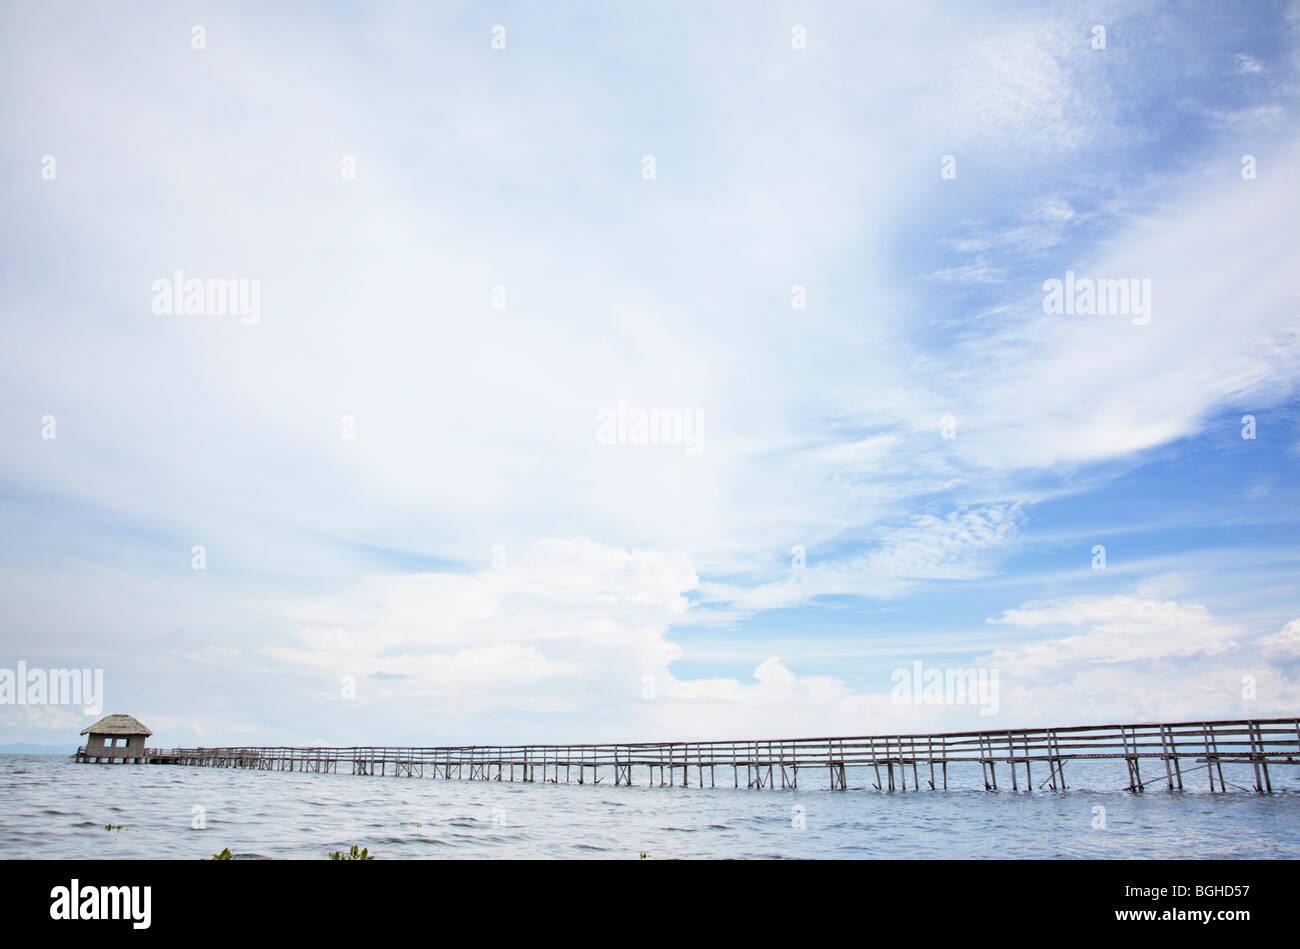 Bamboo Pier Panglao Island; Bohol; The Visayas; Philippines - Stock Image